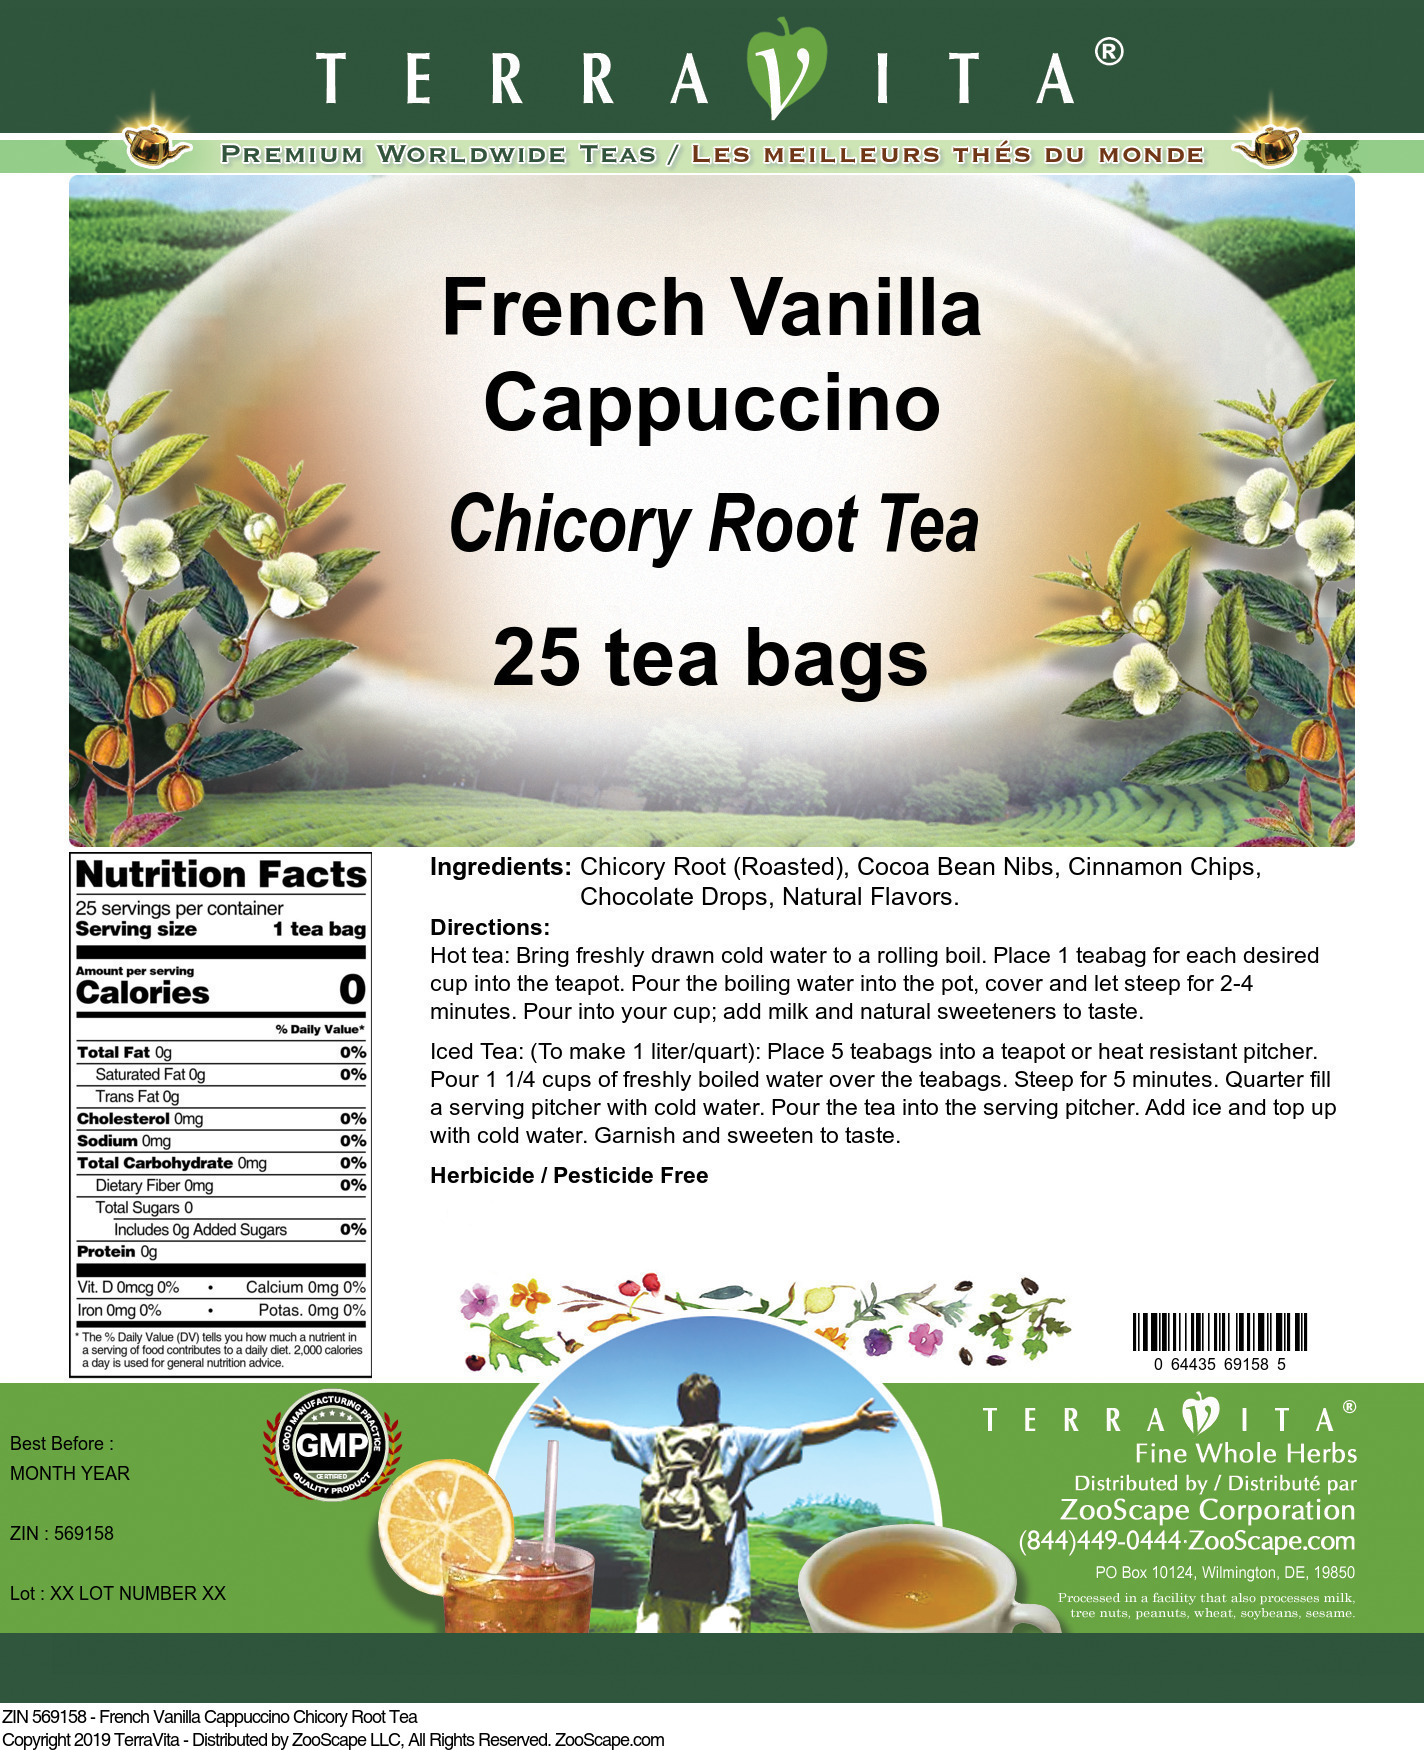 French Vanilla Cappuccino Chicory Root Tea